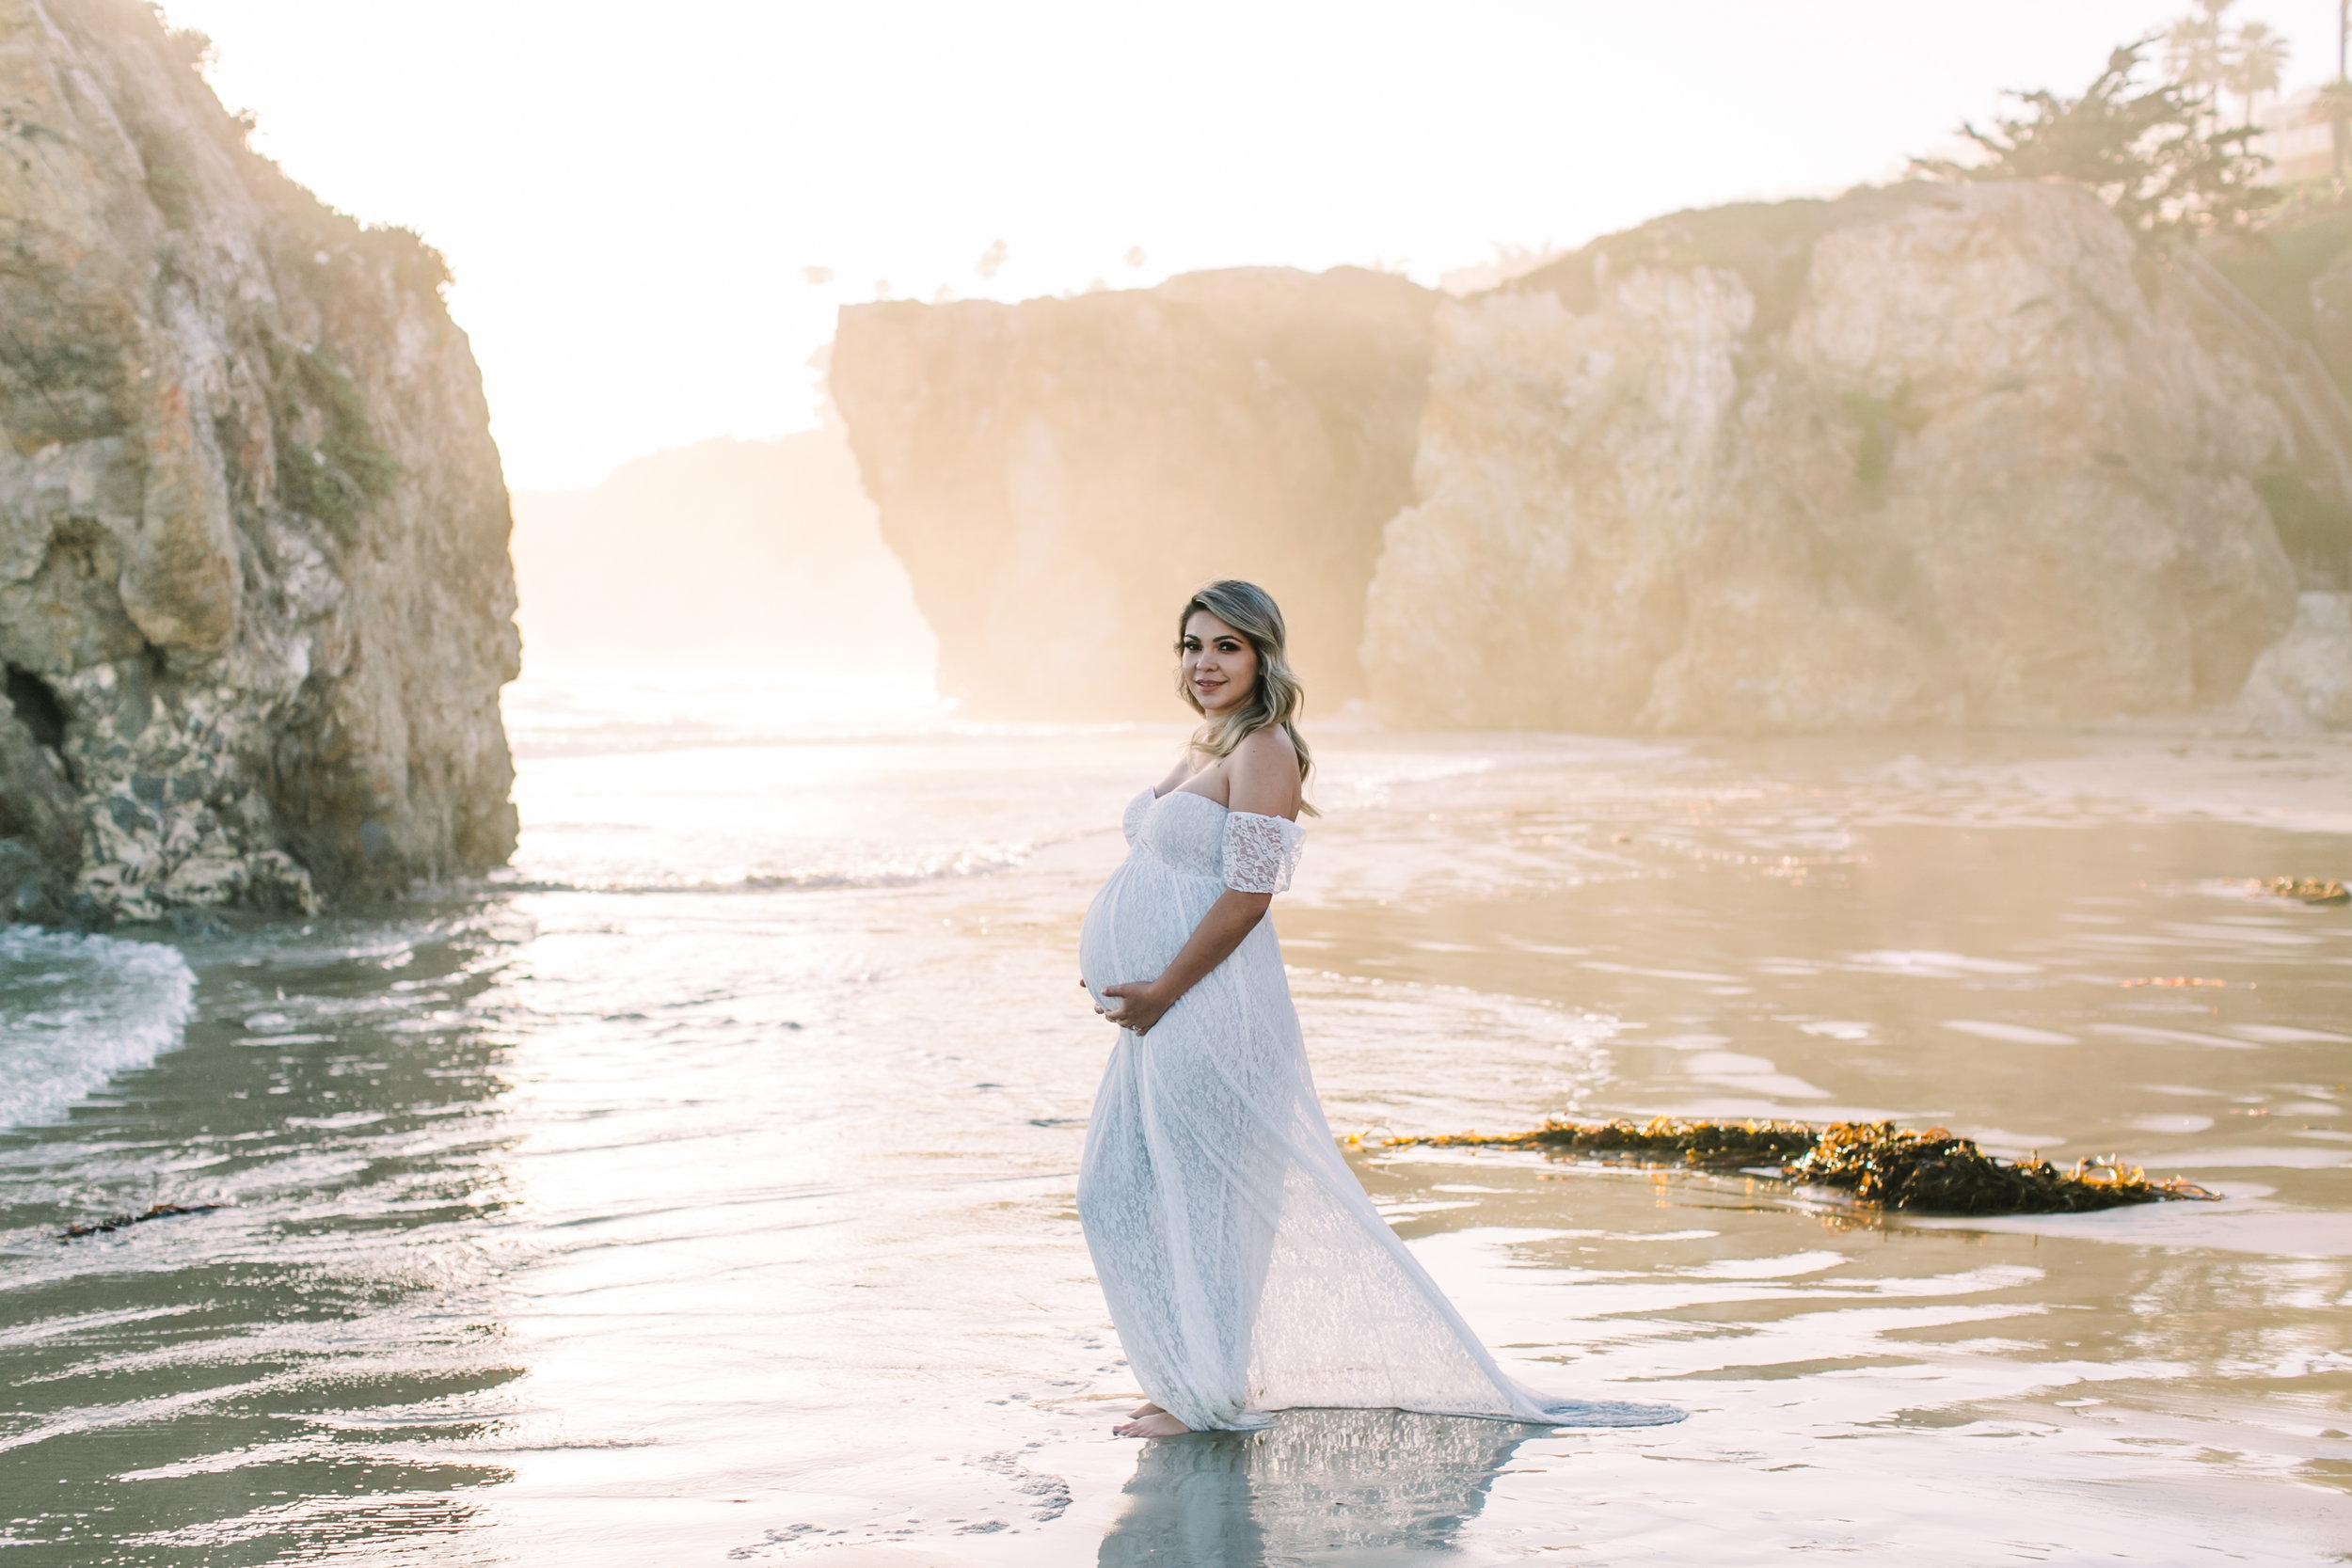 alabama-sunset-romantic-maternity-photos (28 of 40).jpg